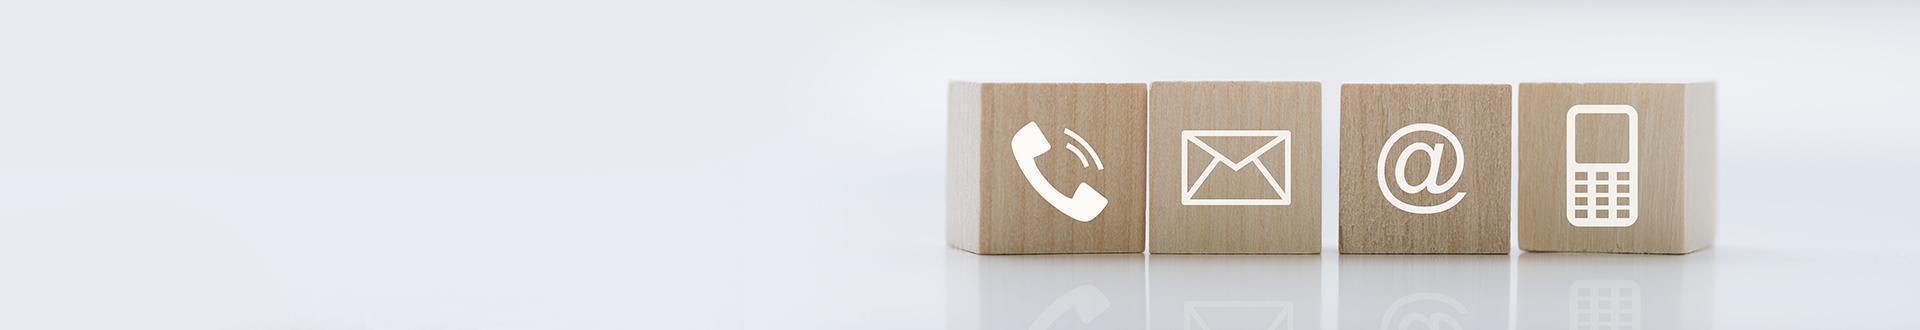 kontakt - banner